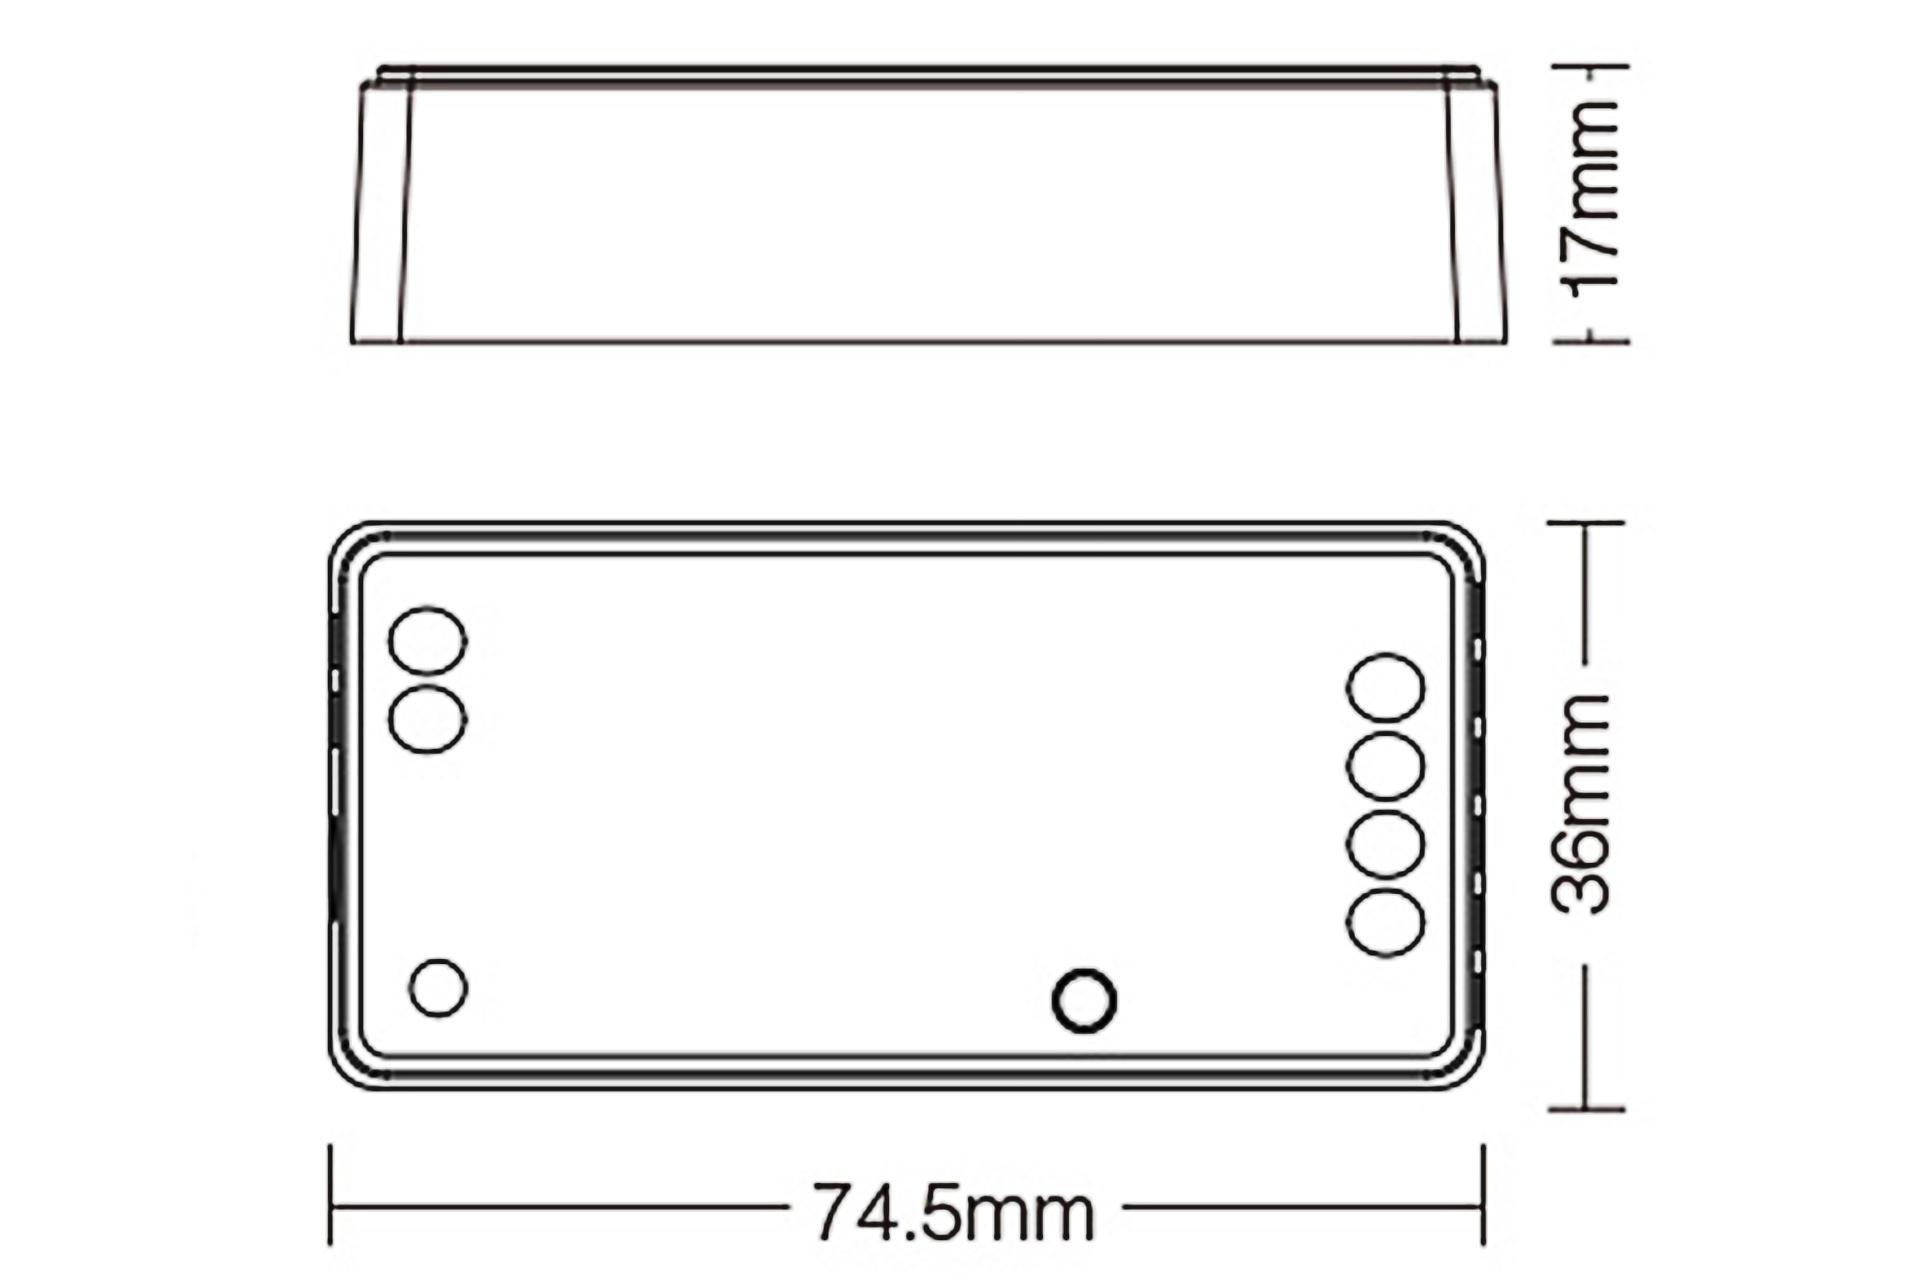 MiLight Miboxer RGB Zigbee 3.0 Dimmer Controller